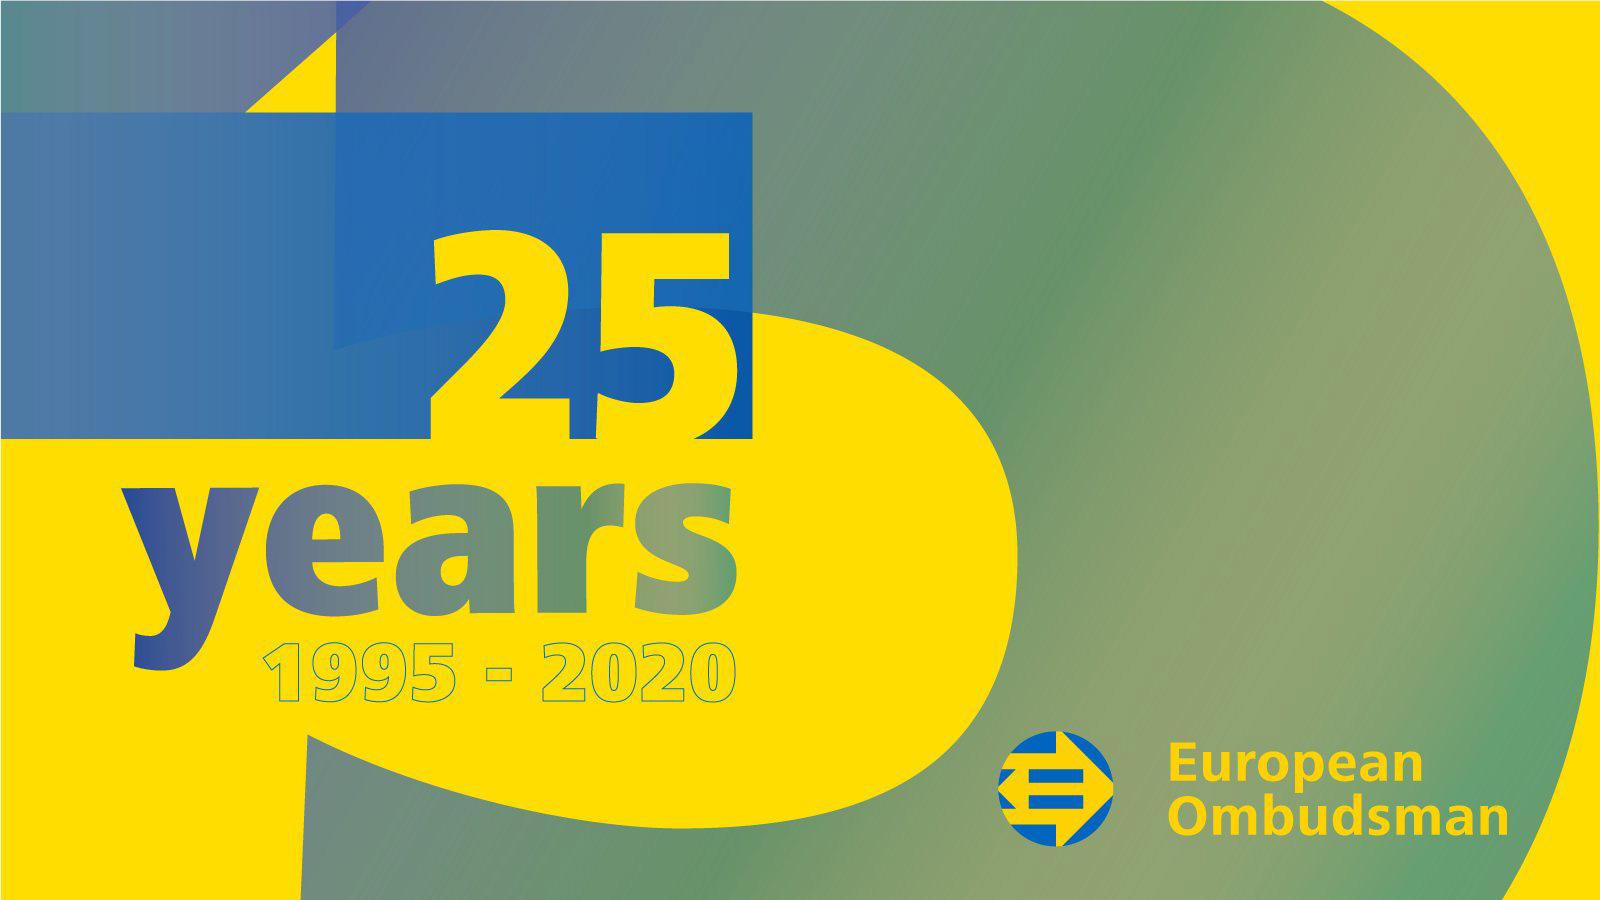 Konferenz zum 25-jährigen Jubiläum